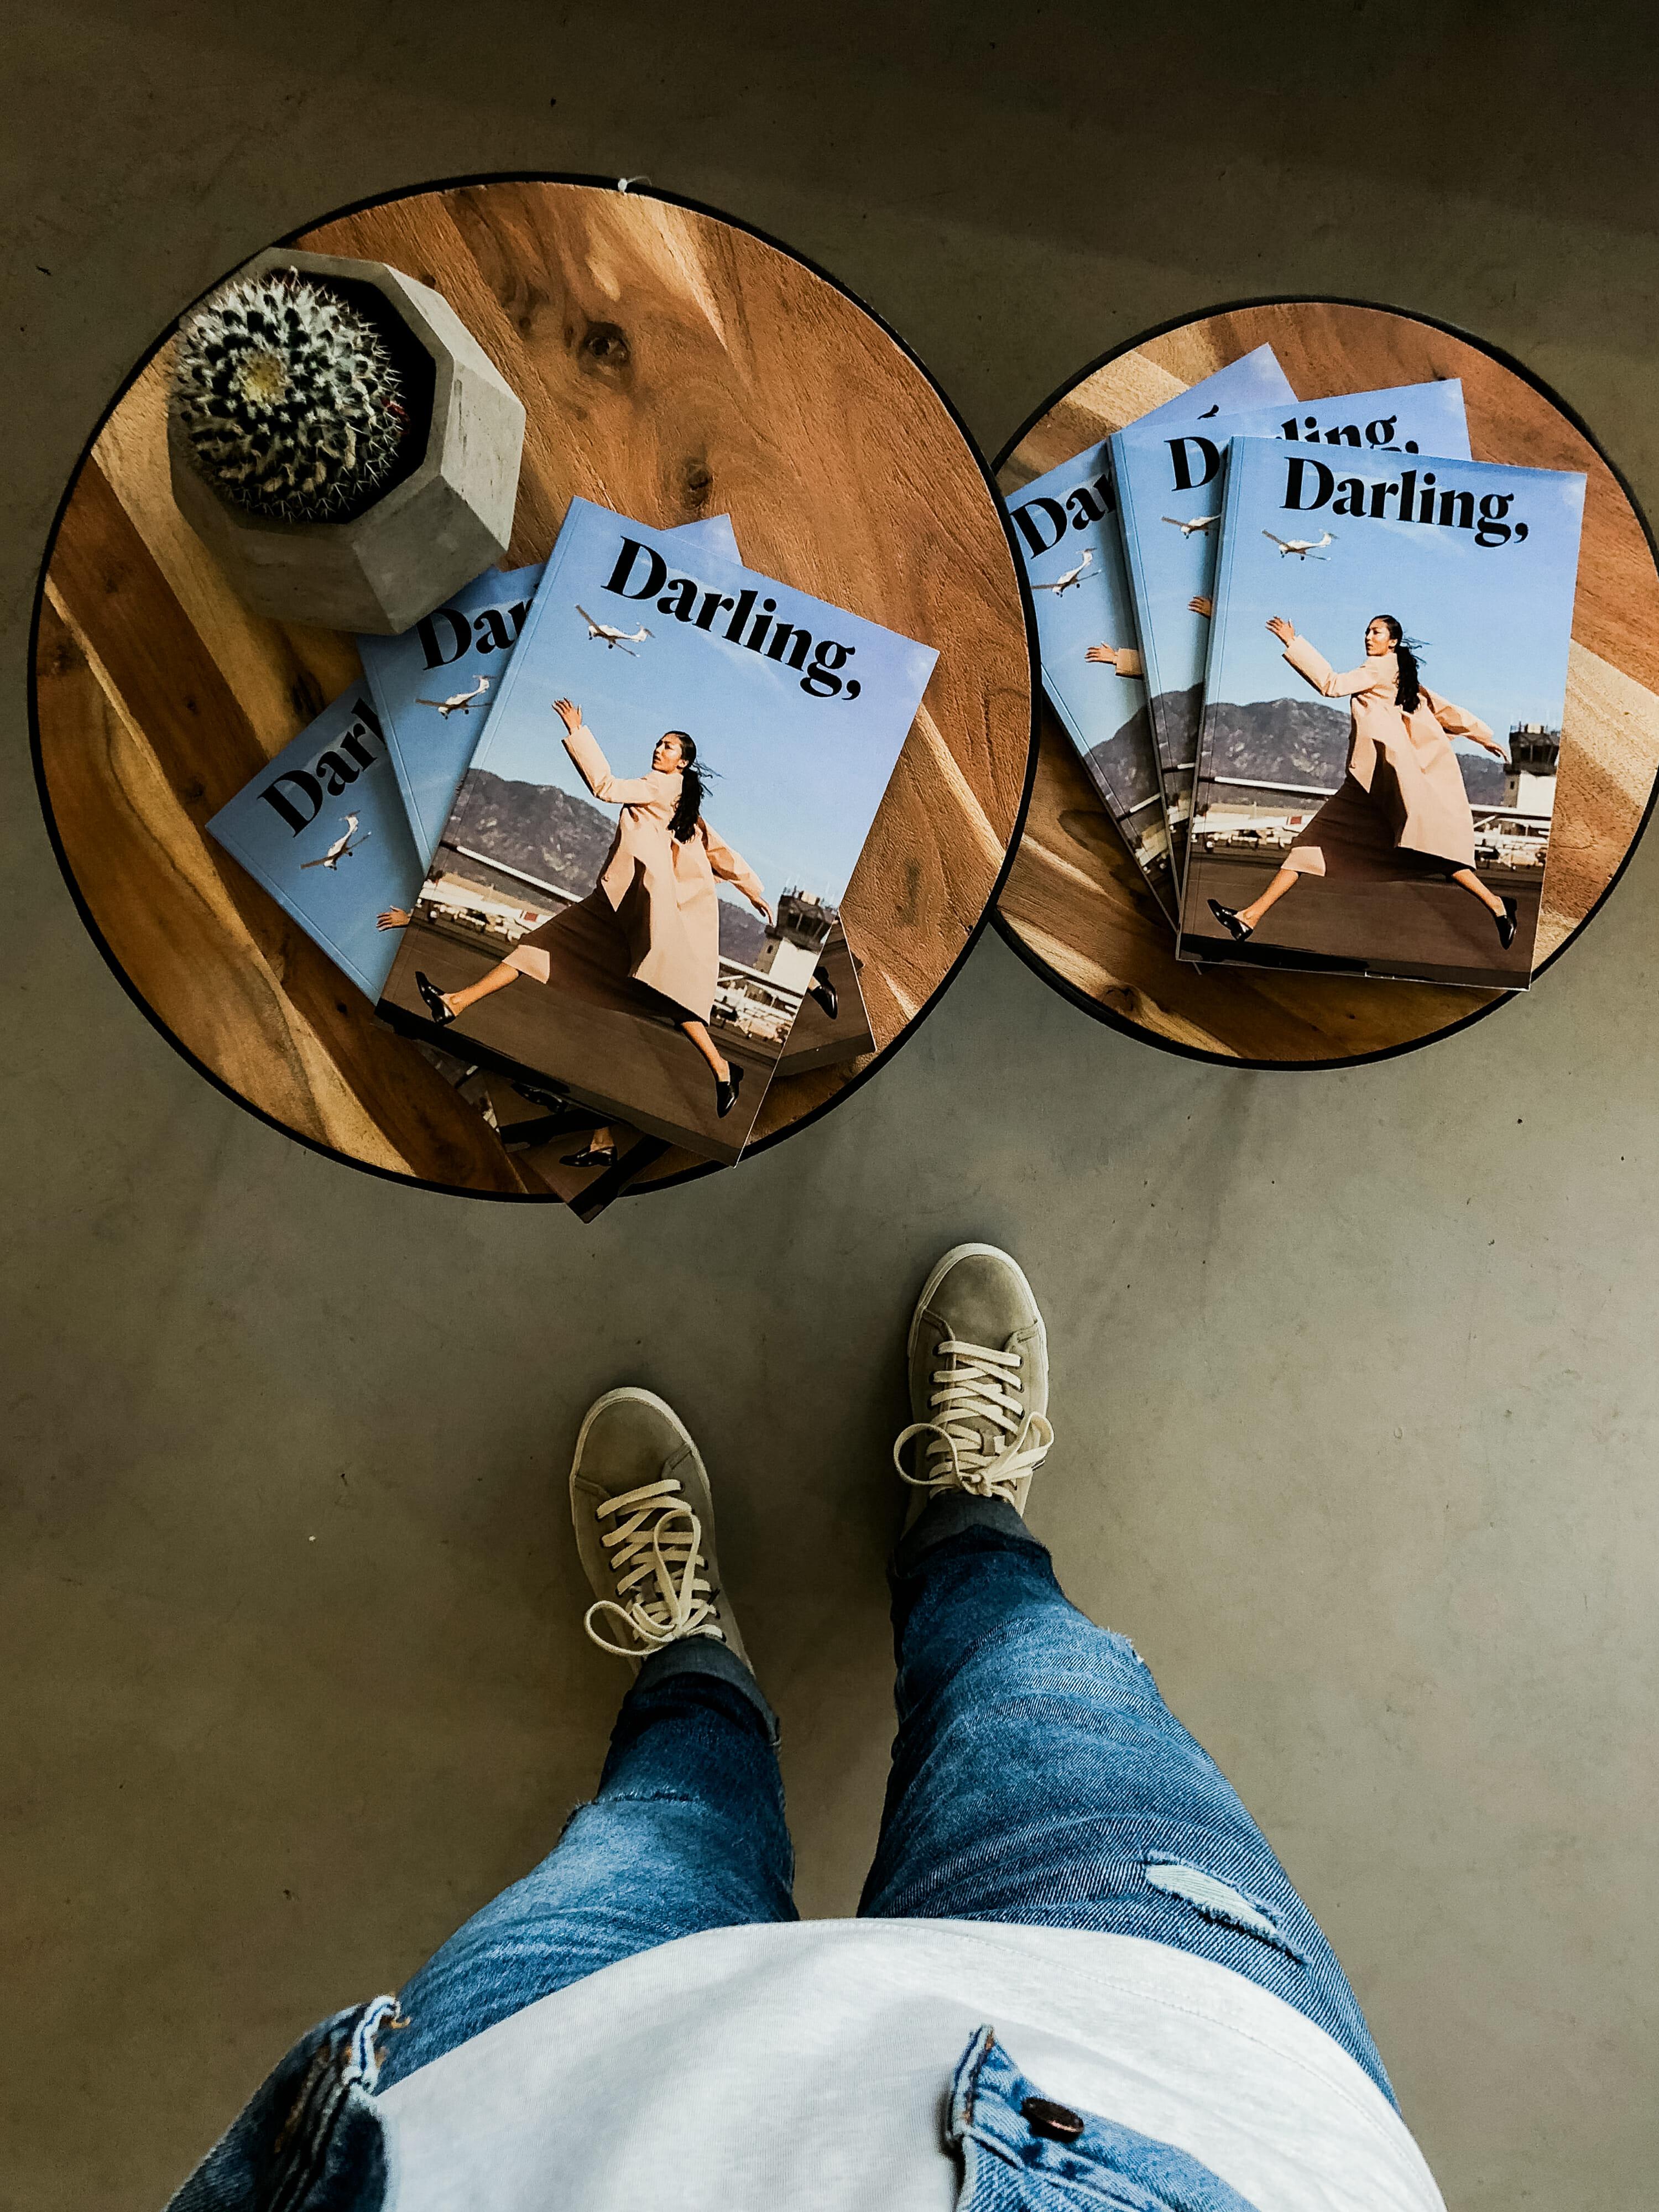 darling magazine overhead shot